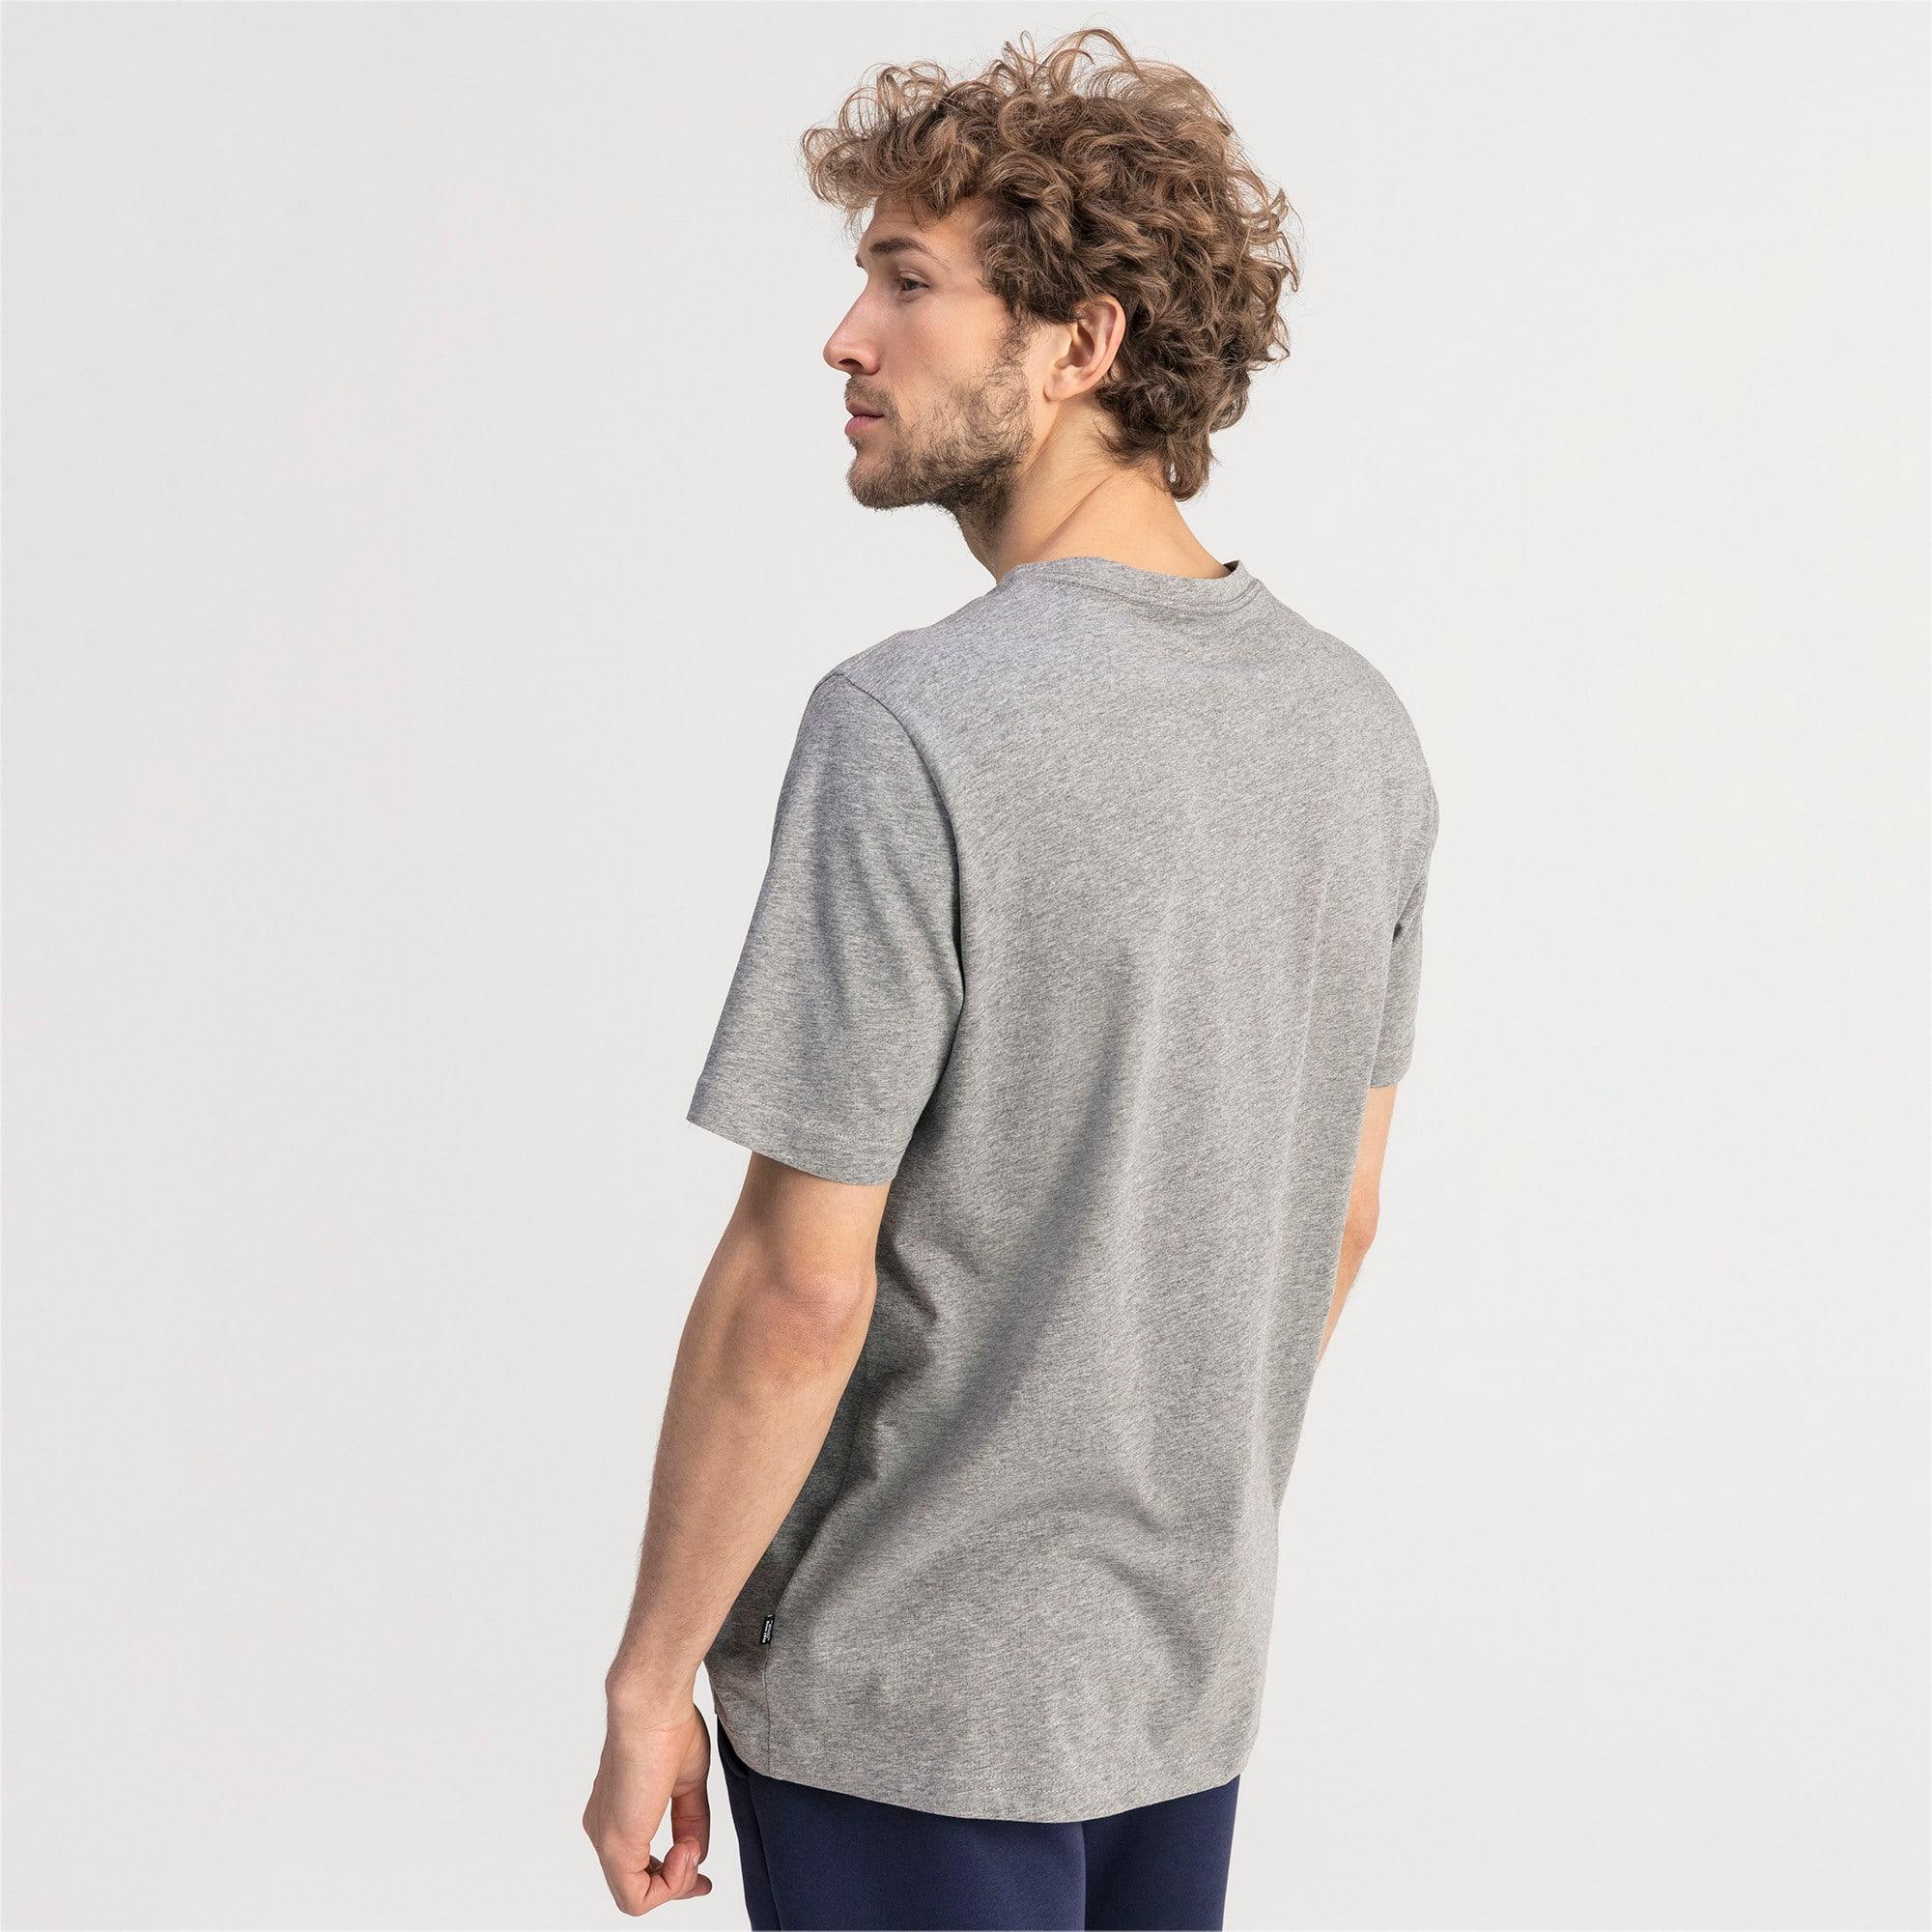 Thumbnail 2 of T-shirt con scollo a V Essentials uomo, Medium Gray Heather, medium